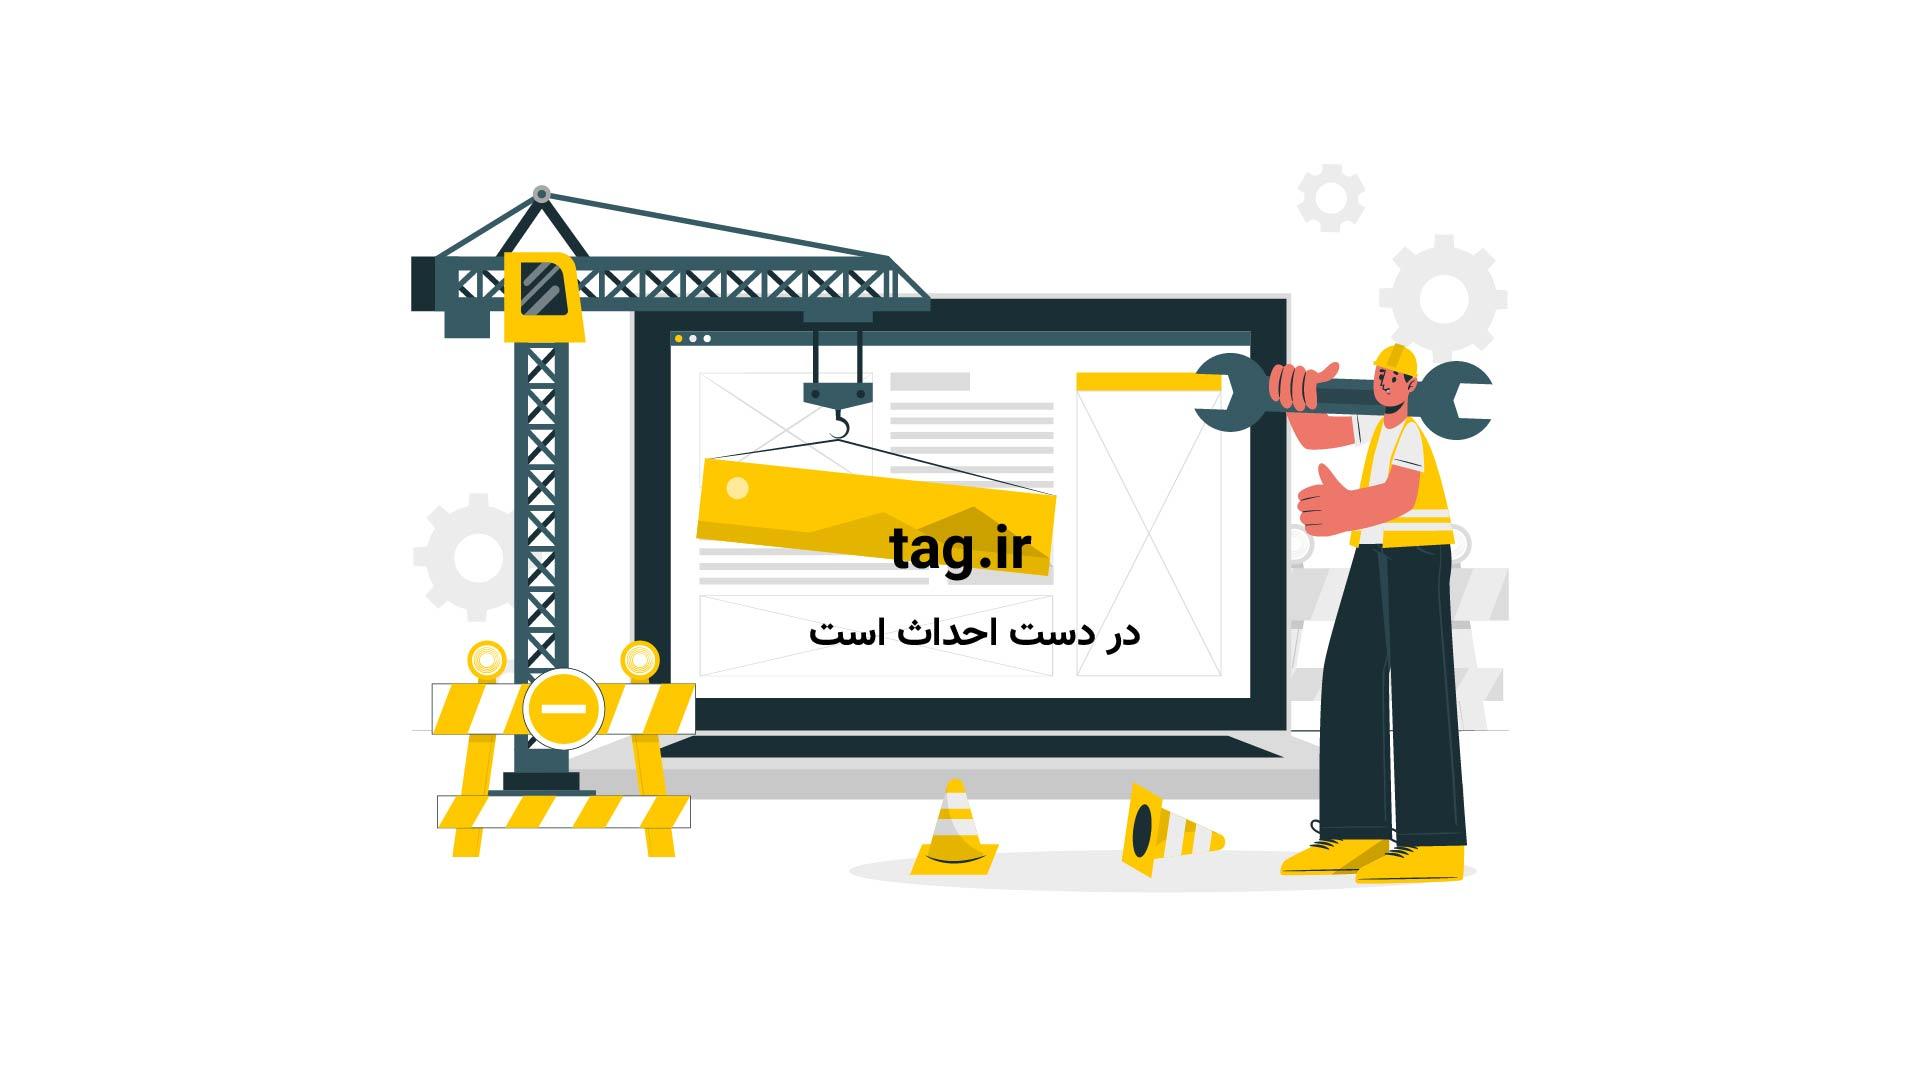 دیوار برلین | تگ